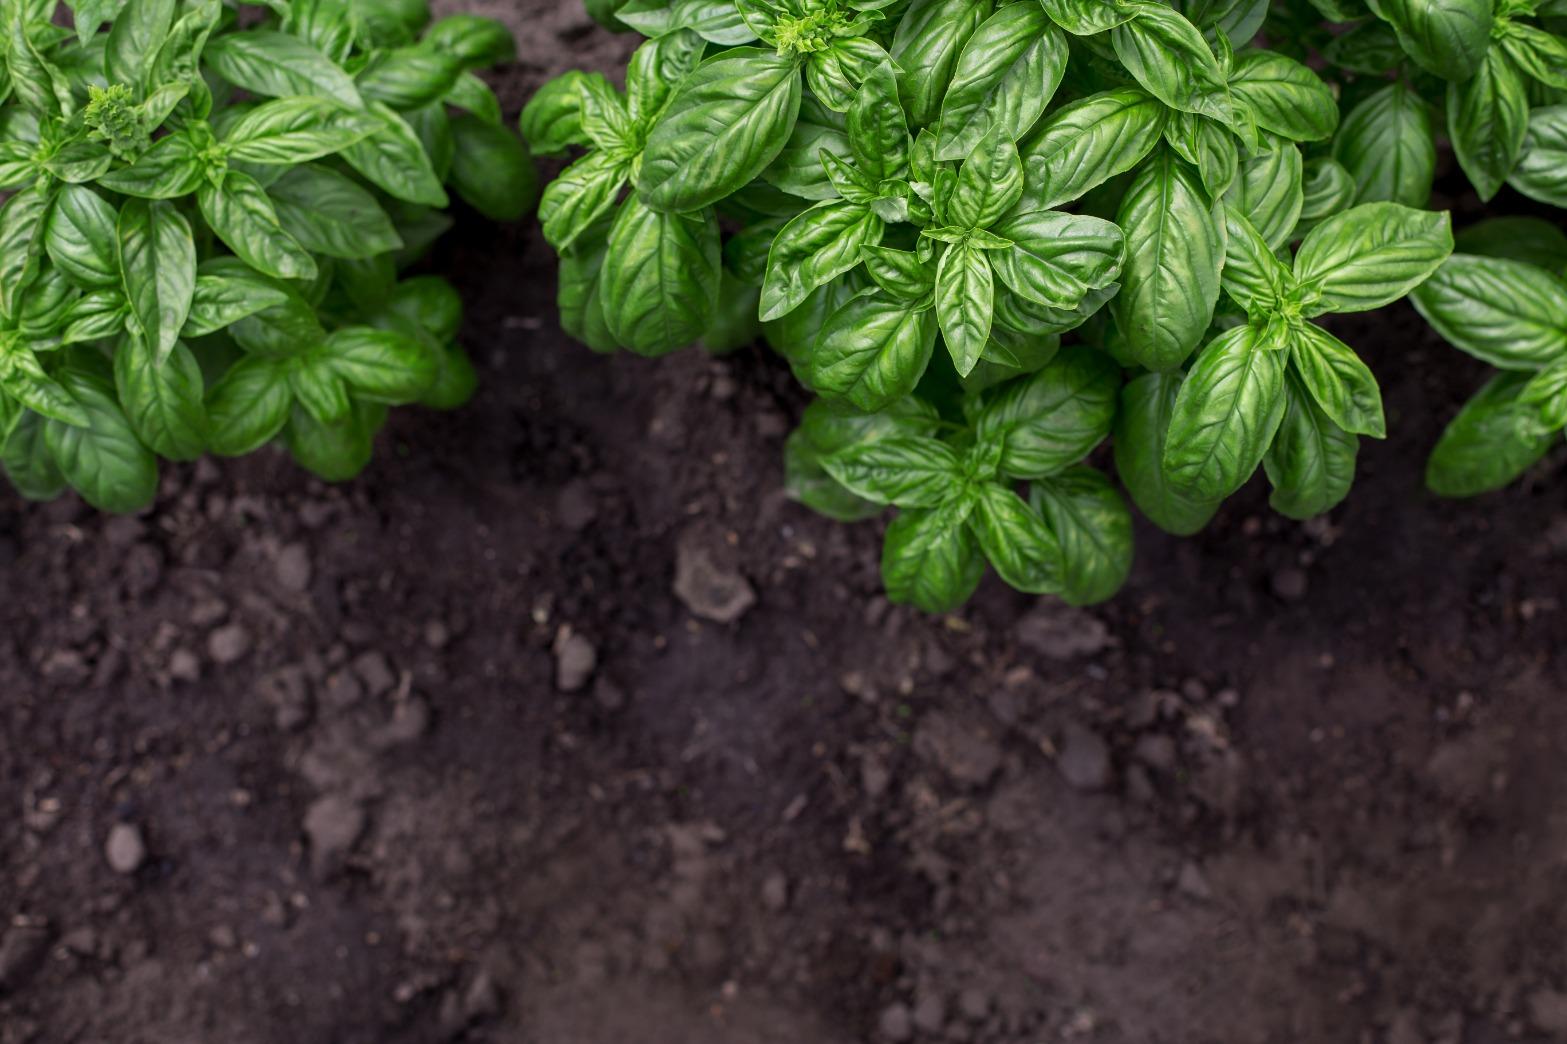 license-organic-green-basil-plant-in-the-garden-5559576.jpg